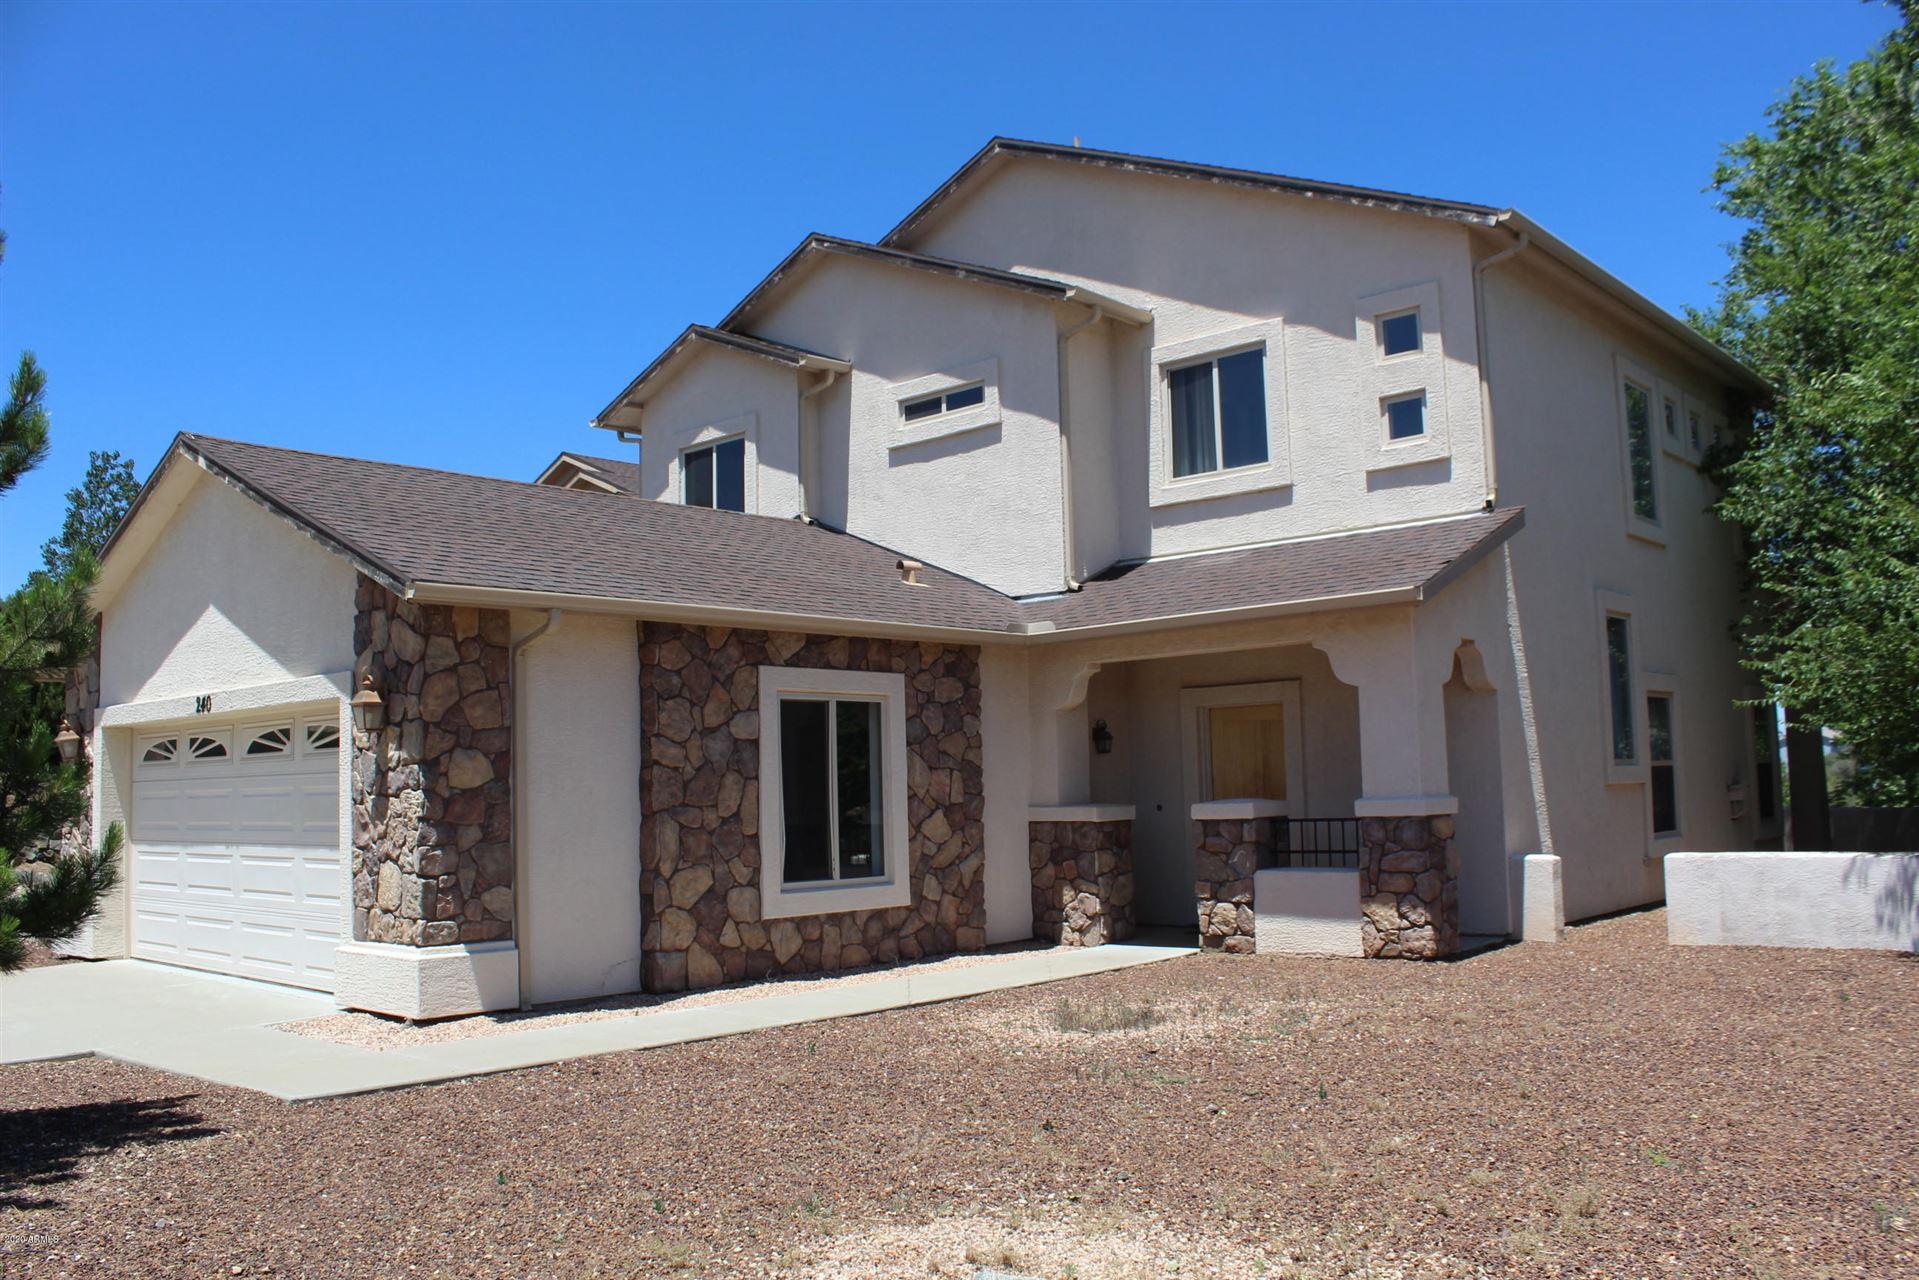 240 LAKEWOOD Cove, Prescott, AZ 86301 - #: 6093529